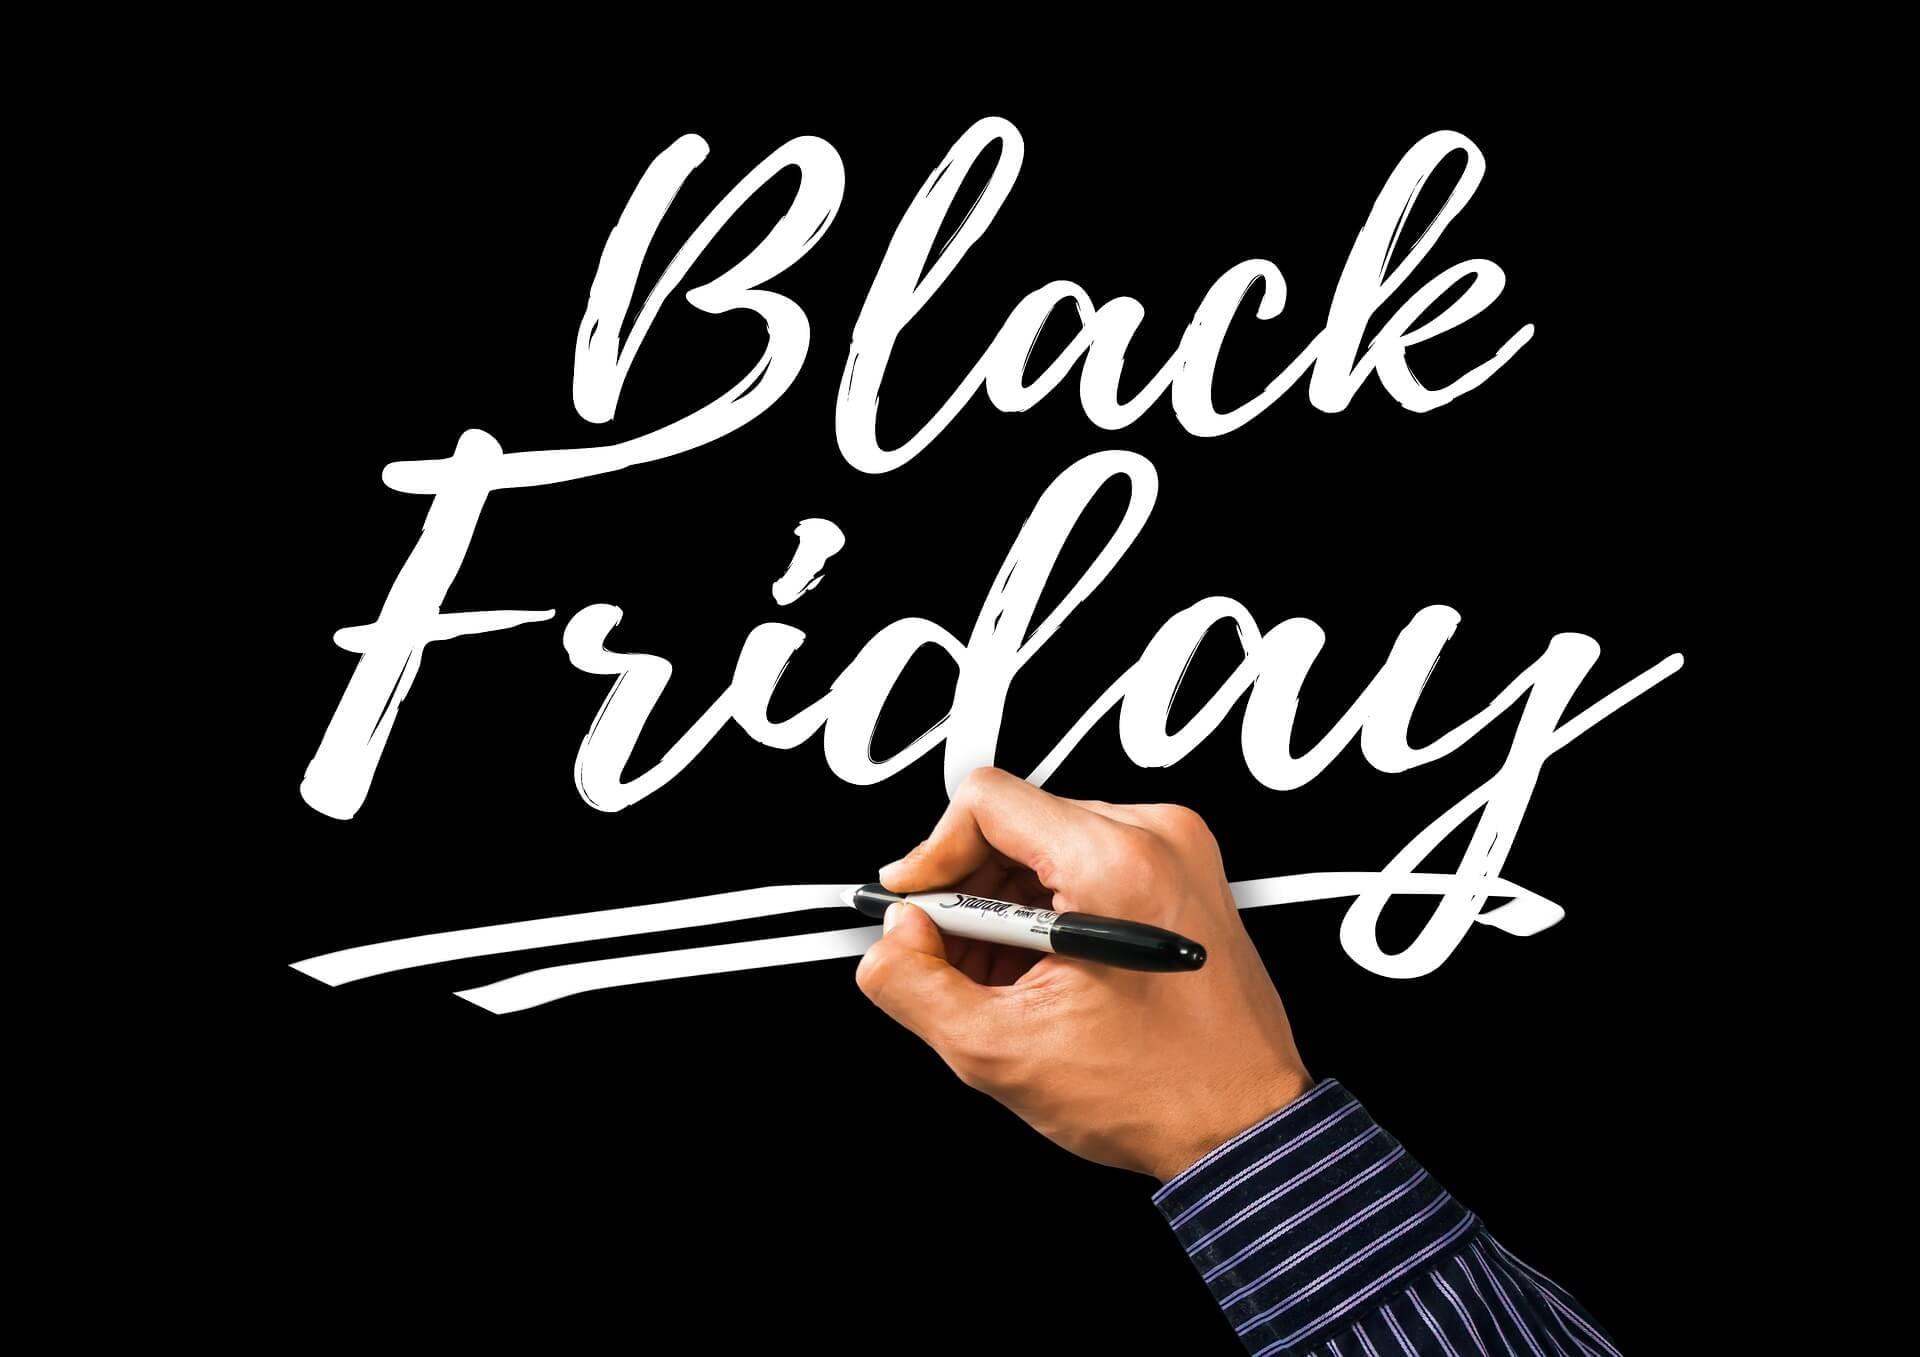 Black Friday Scam